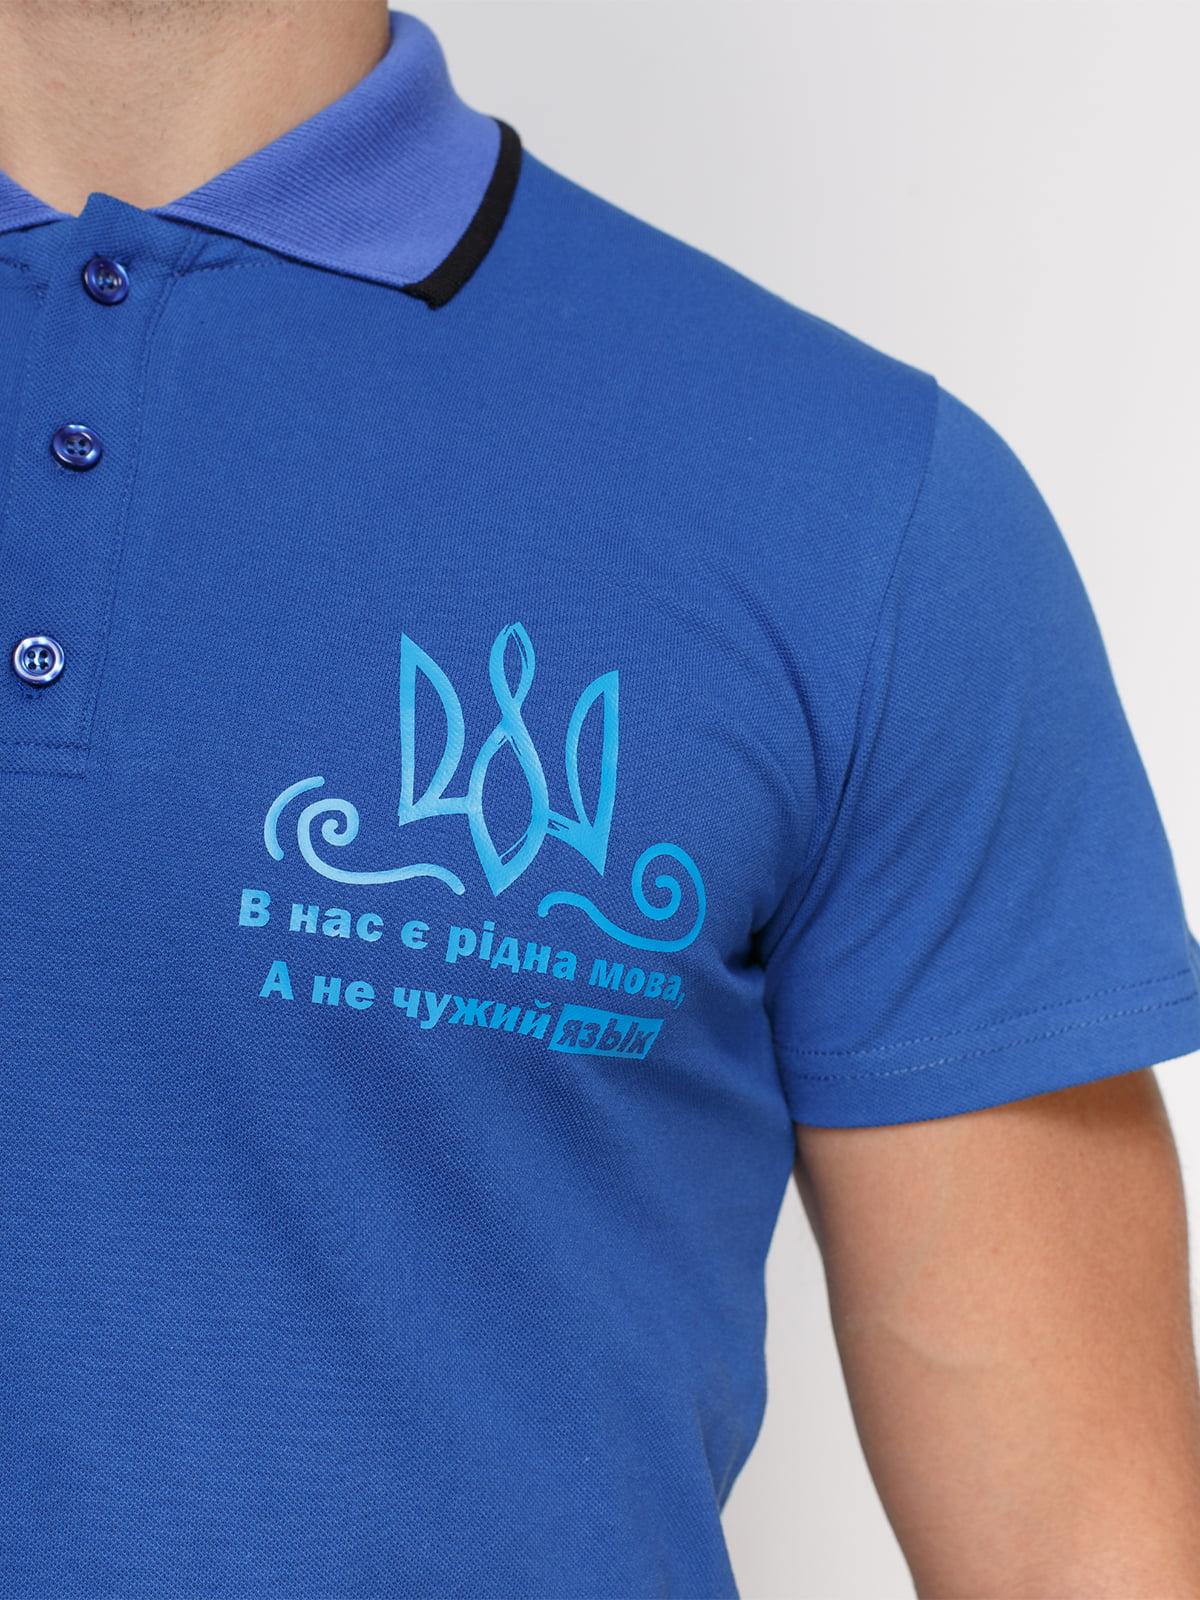 Футболка-поло синя з принтом | 4578505 | фото 3